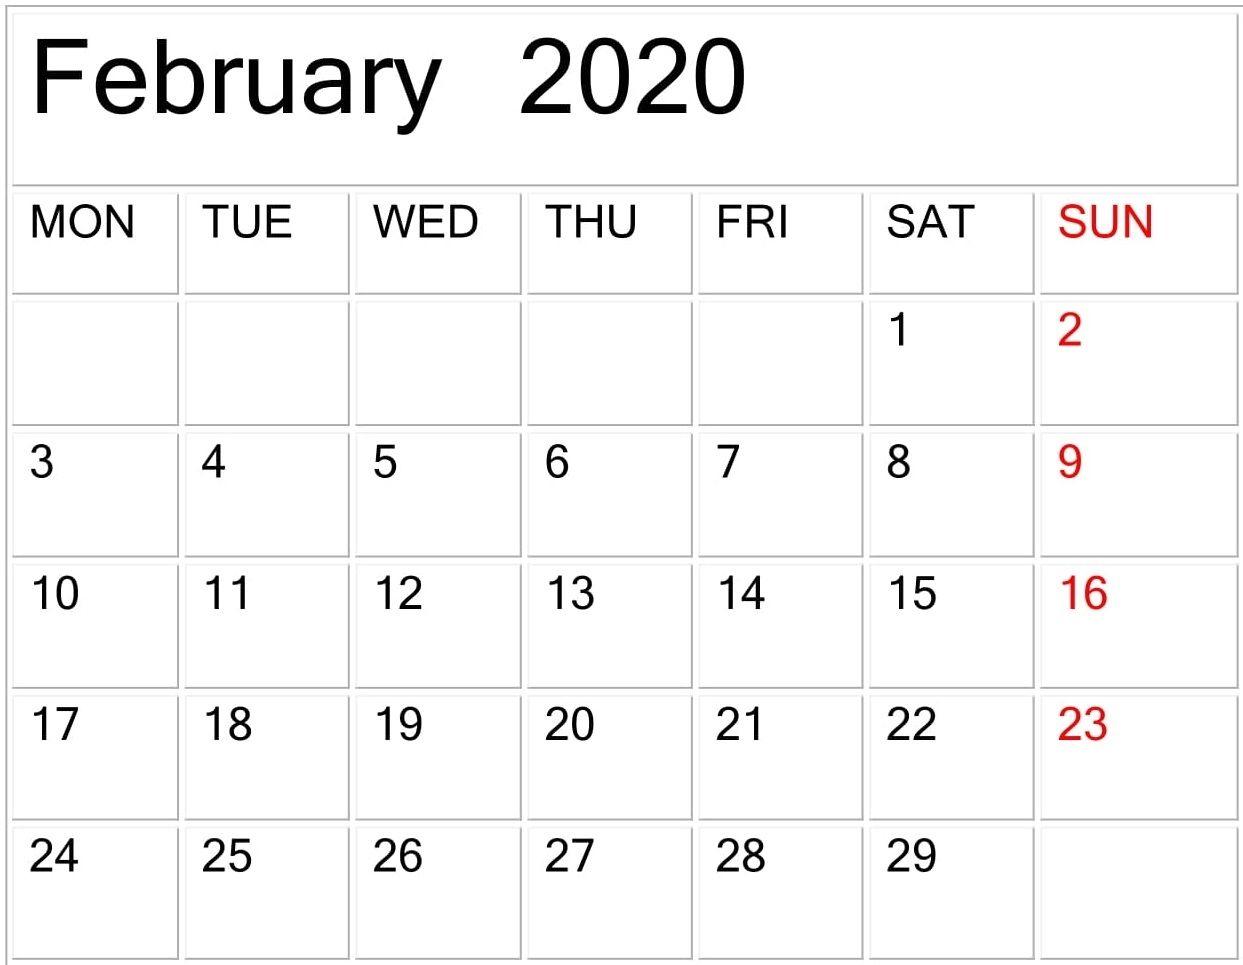 Free Printable Calendar Large Print In 2020 | Printable in 2021 Large Print Calendar Monthly